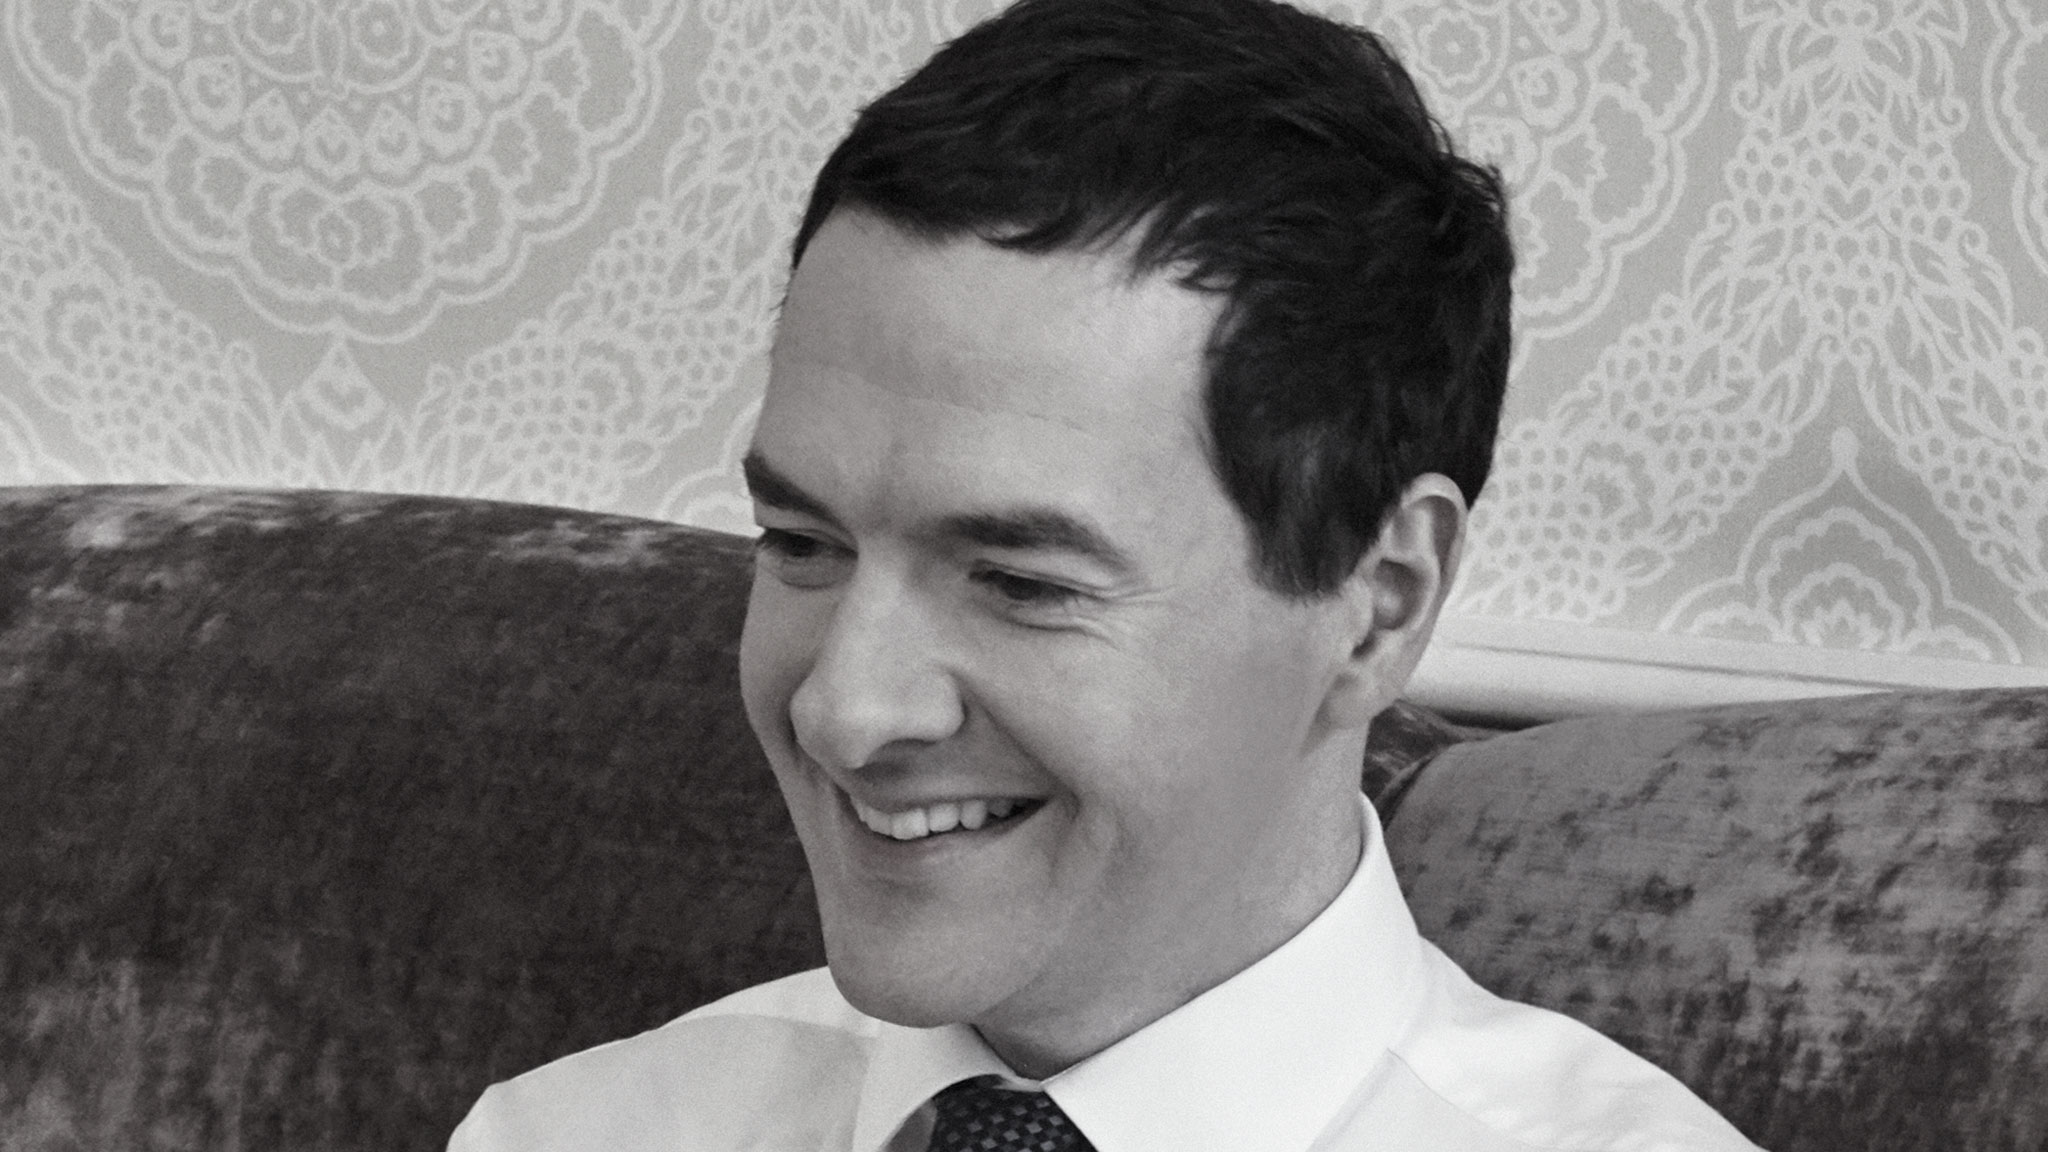 The reinvention of George Osborne